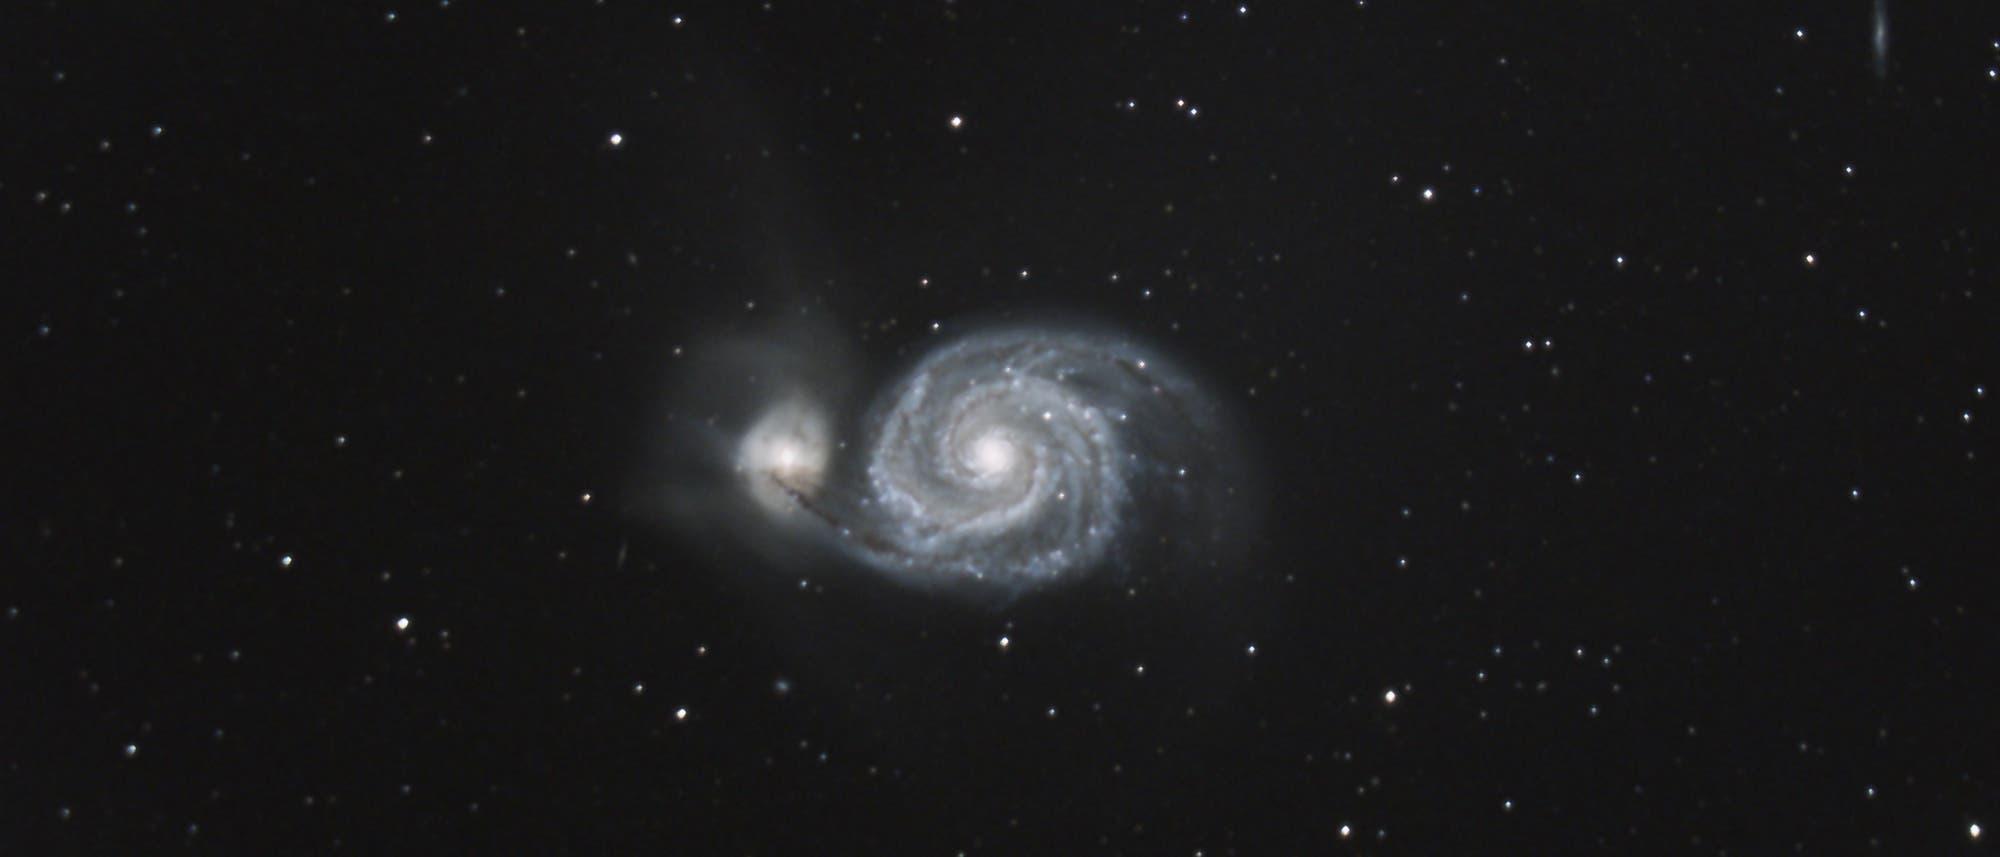 Messier 51 - Whirlpool-Galaxie